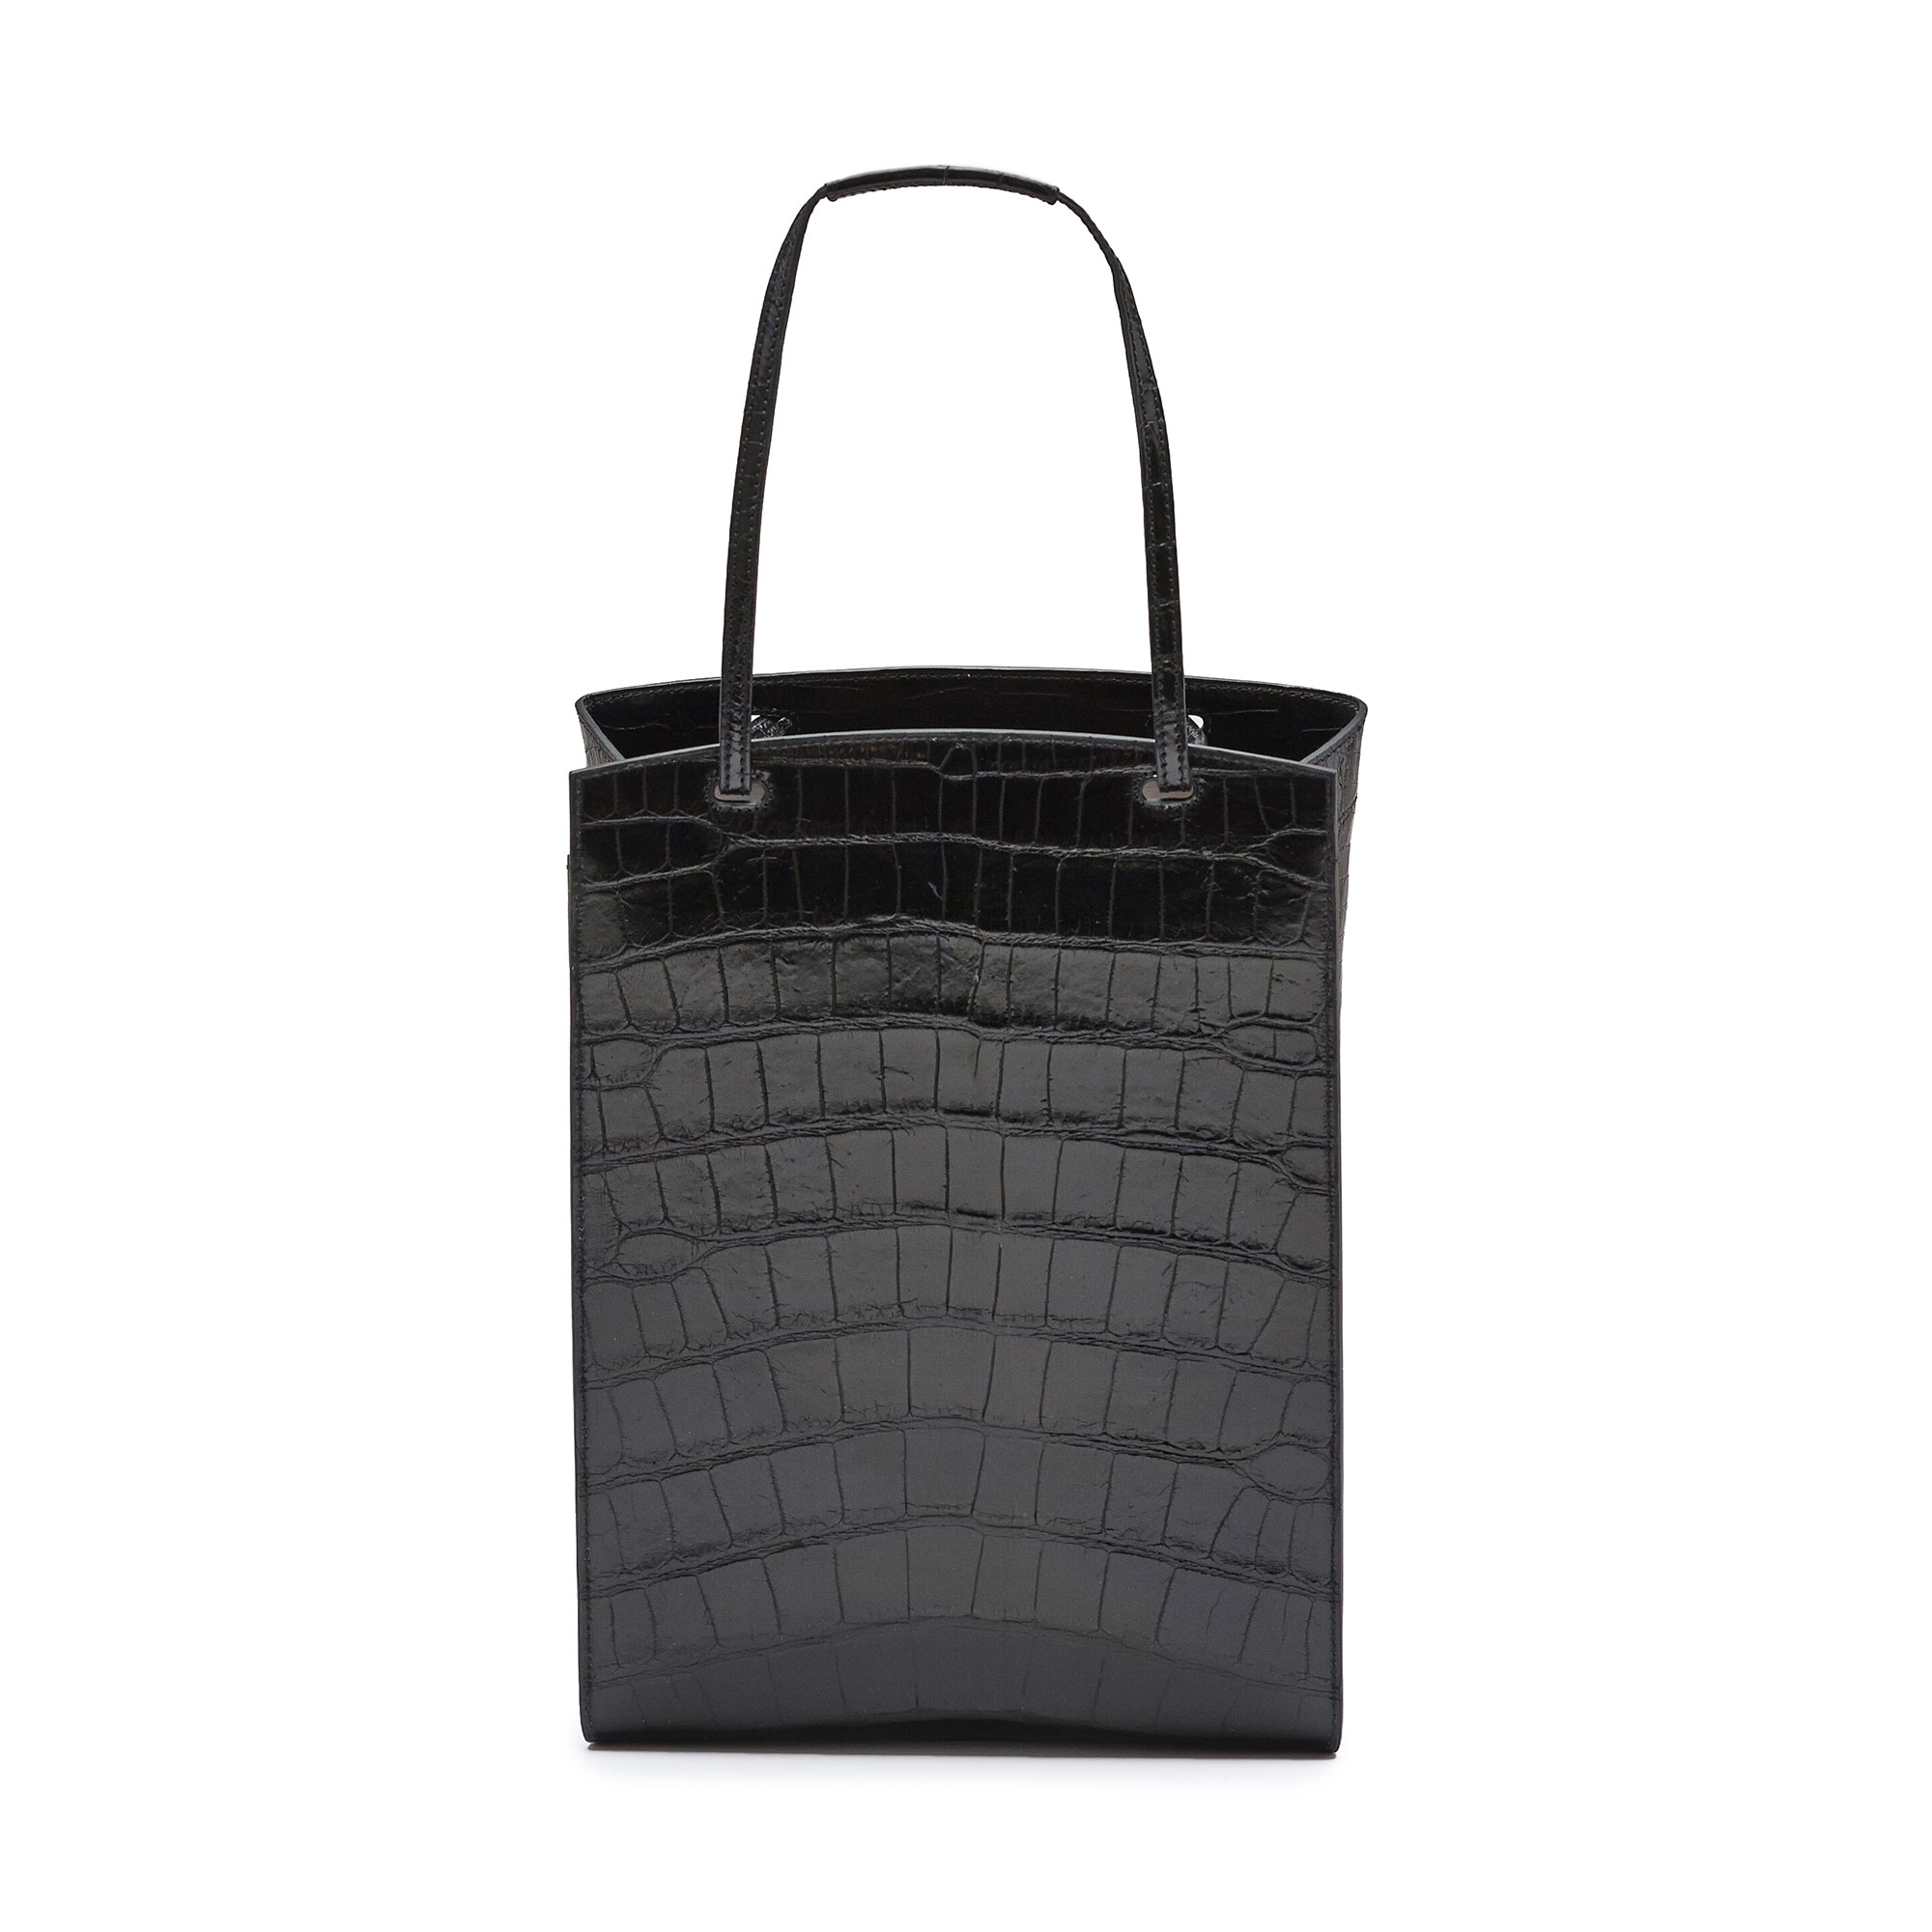 The black alligator Arizona bucket bag by Bertoni 1949 03